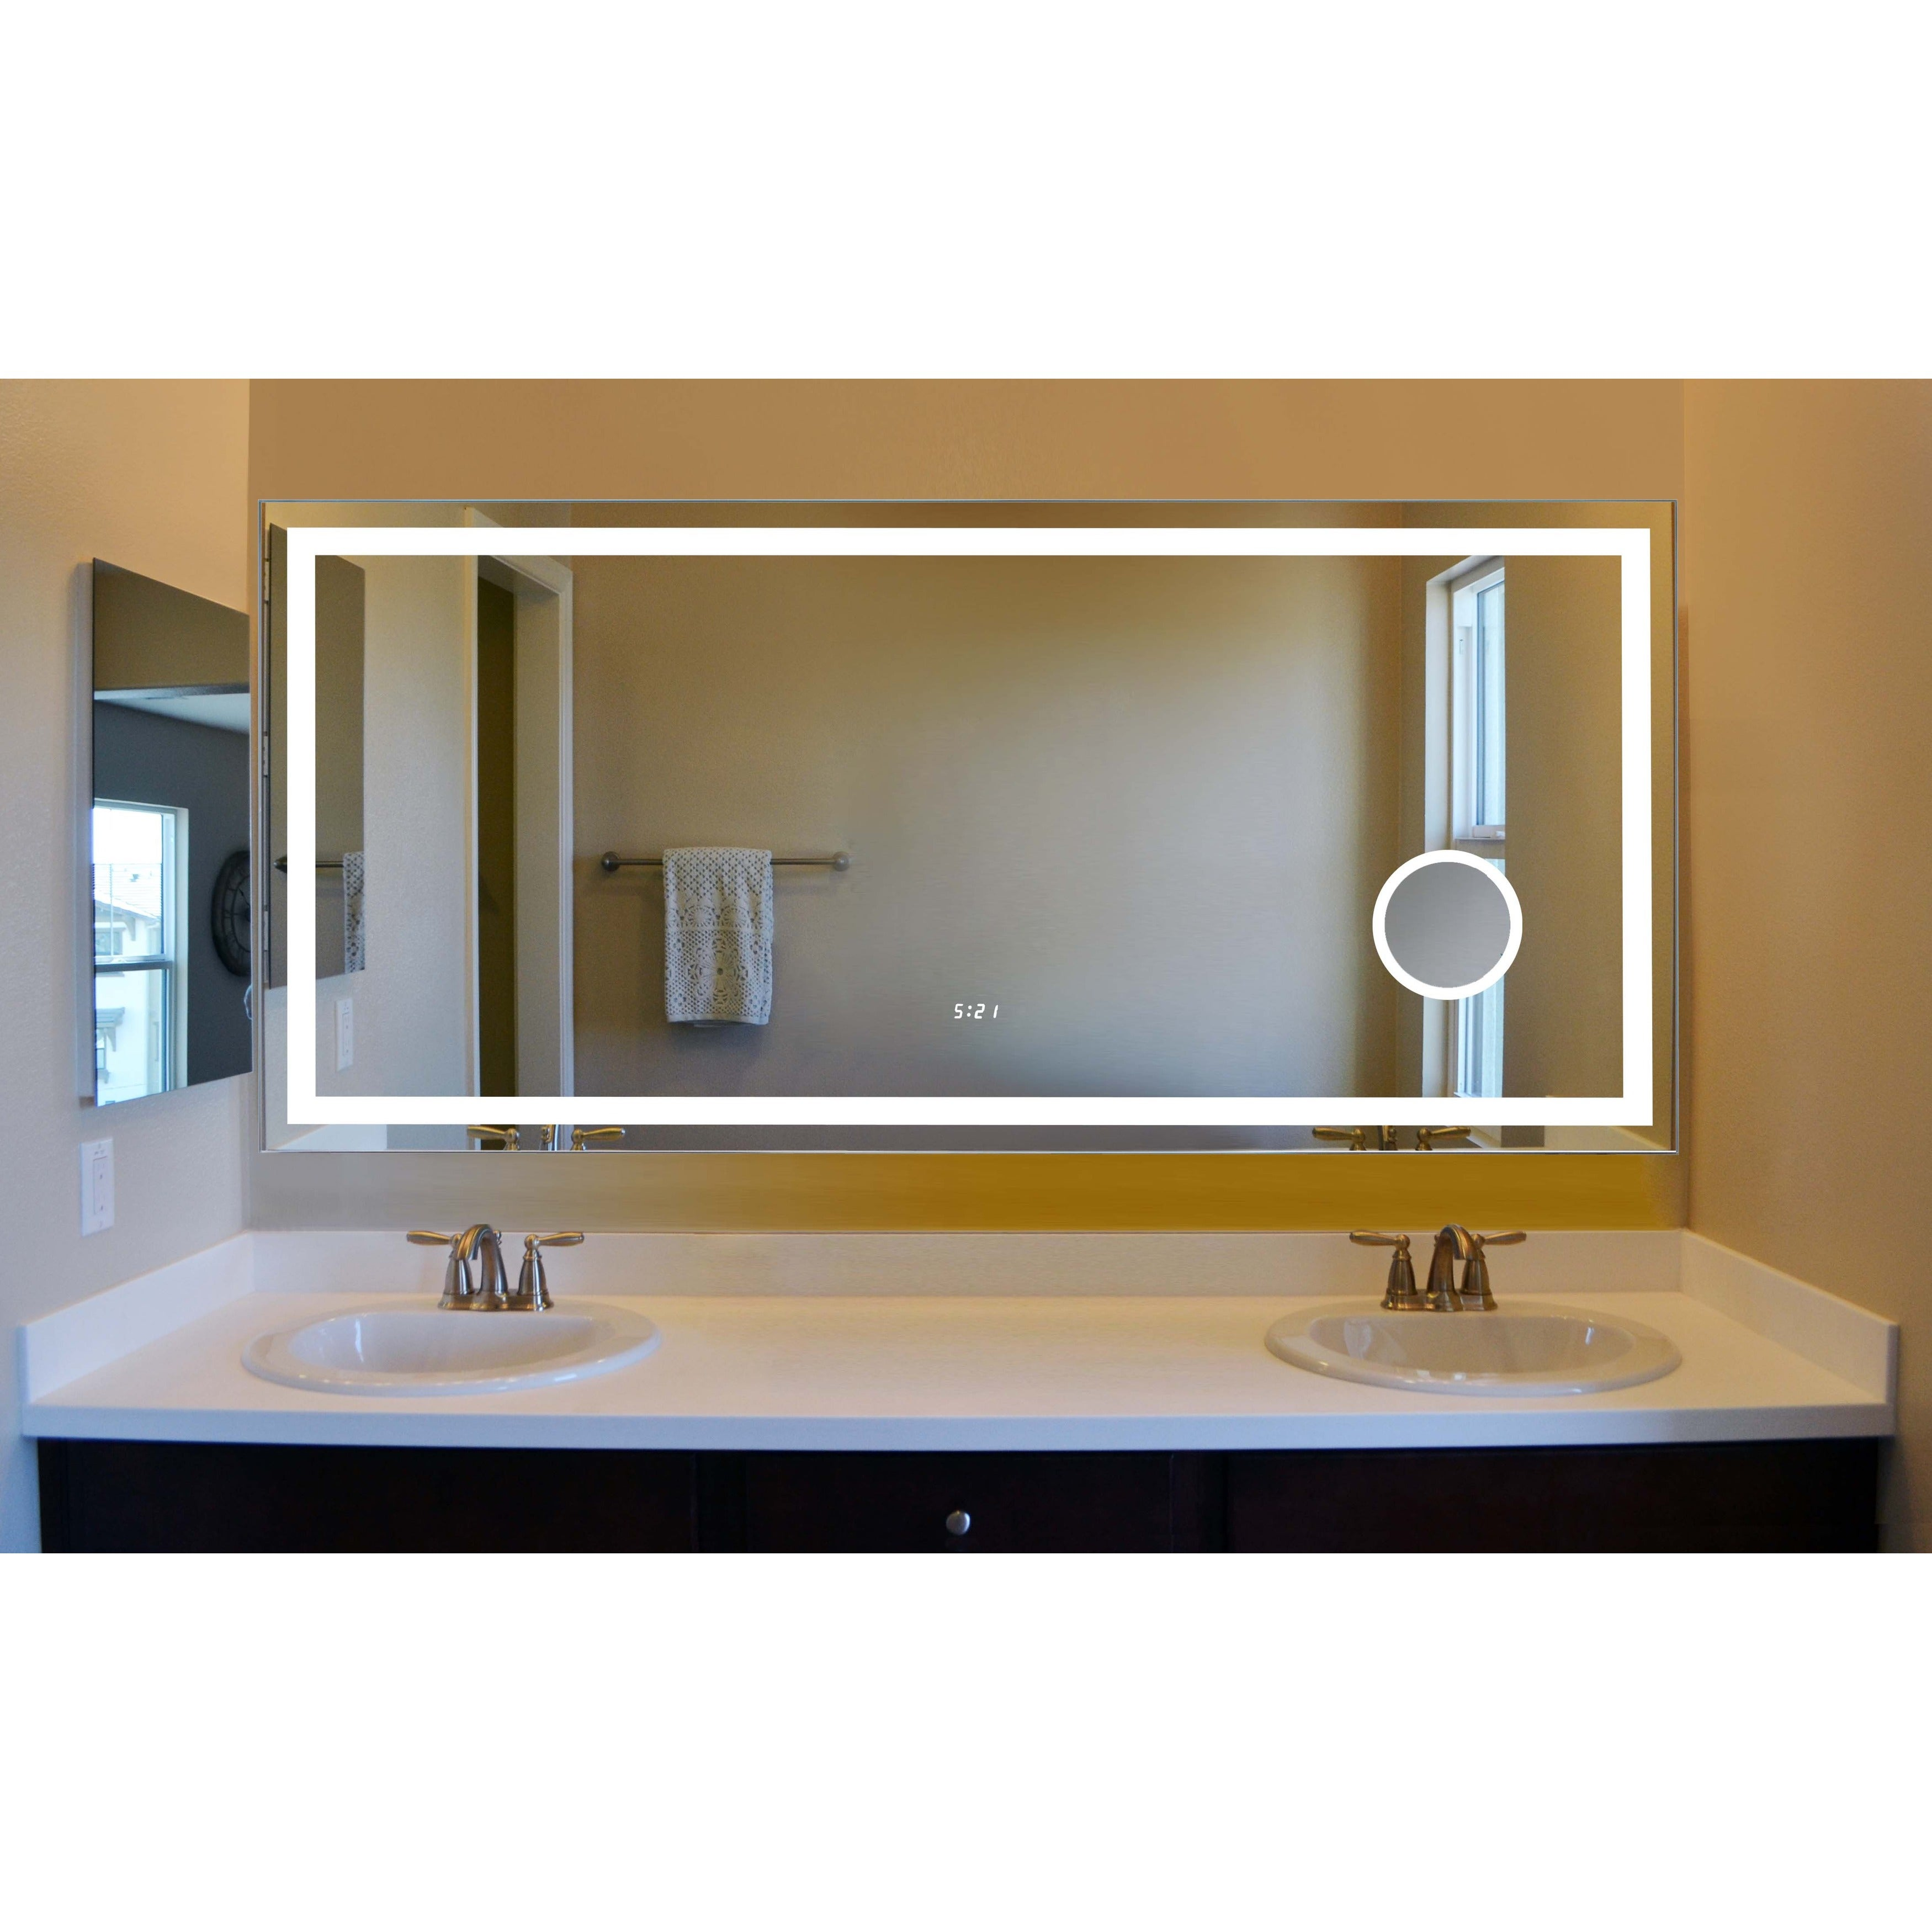 Innoci Usa Eros Led Wall Mount Lighted Vanity Mirror Featuring Built In Cosmetic Digital Display Clock Ir Sensor